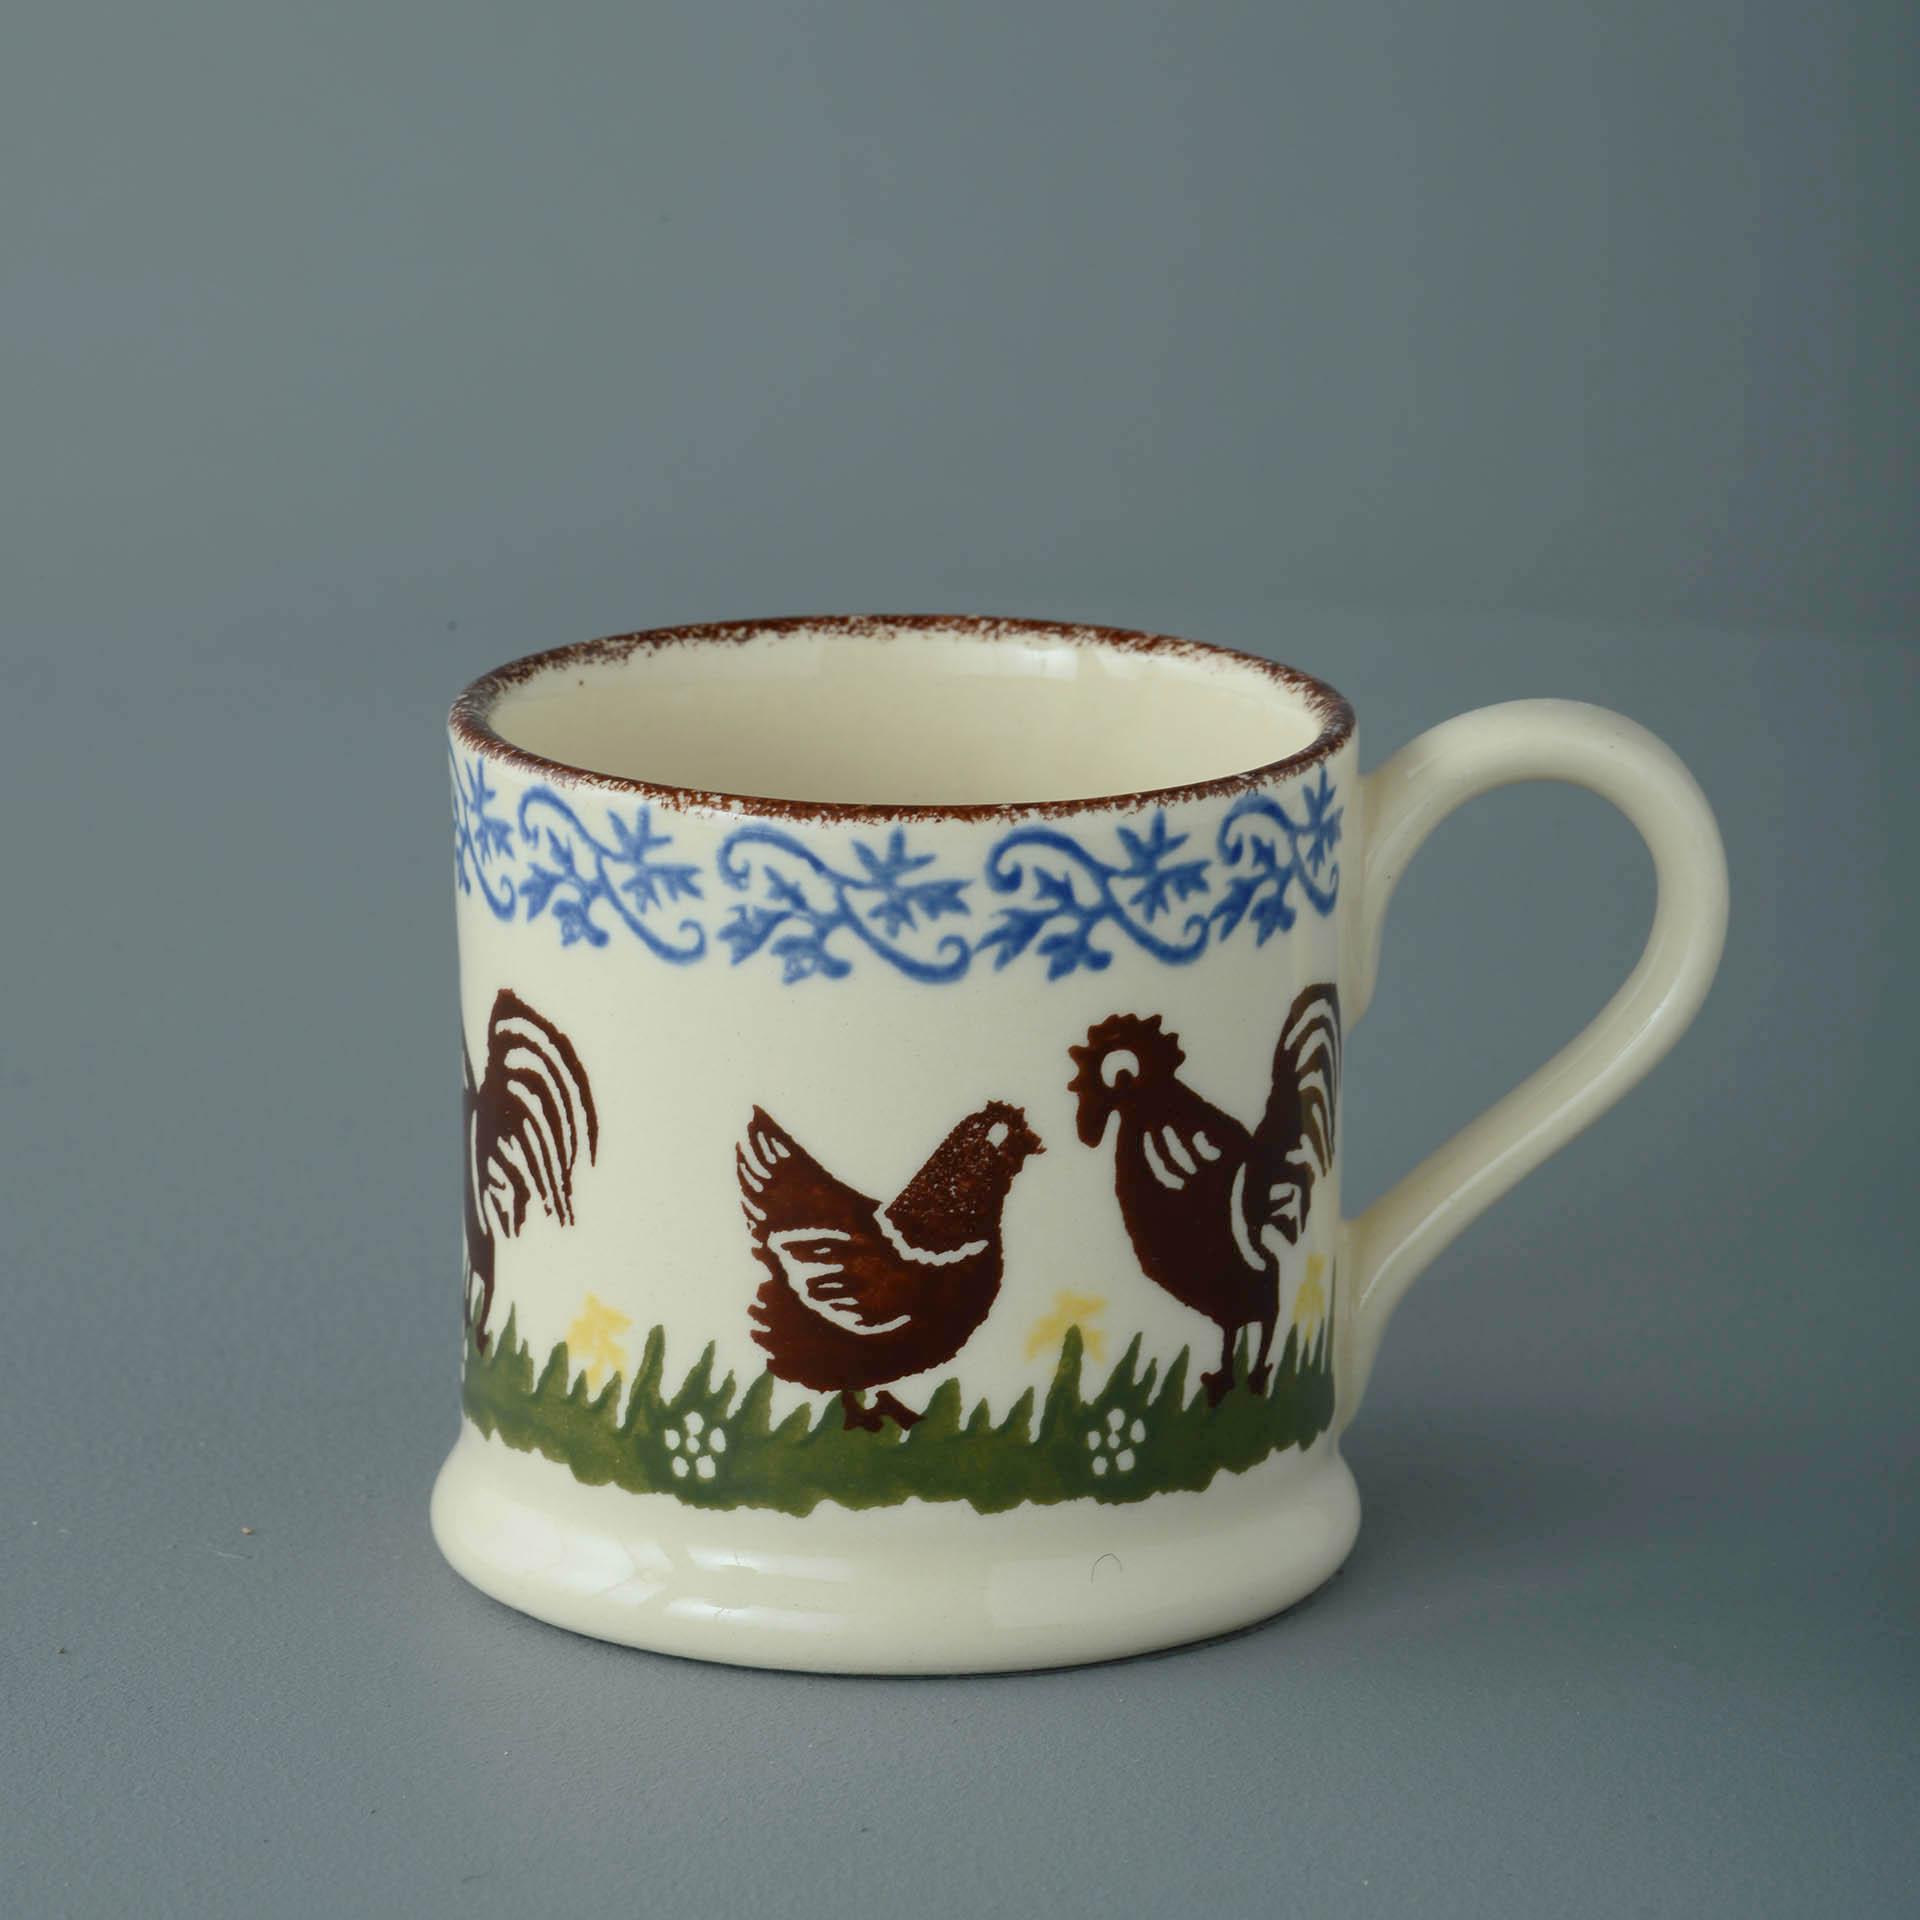 Cock & Hen 150ml Small Mug 7 x 7.3cm